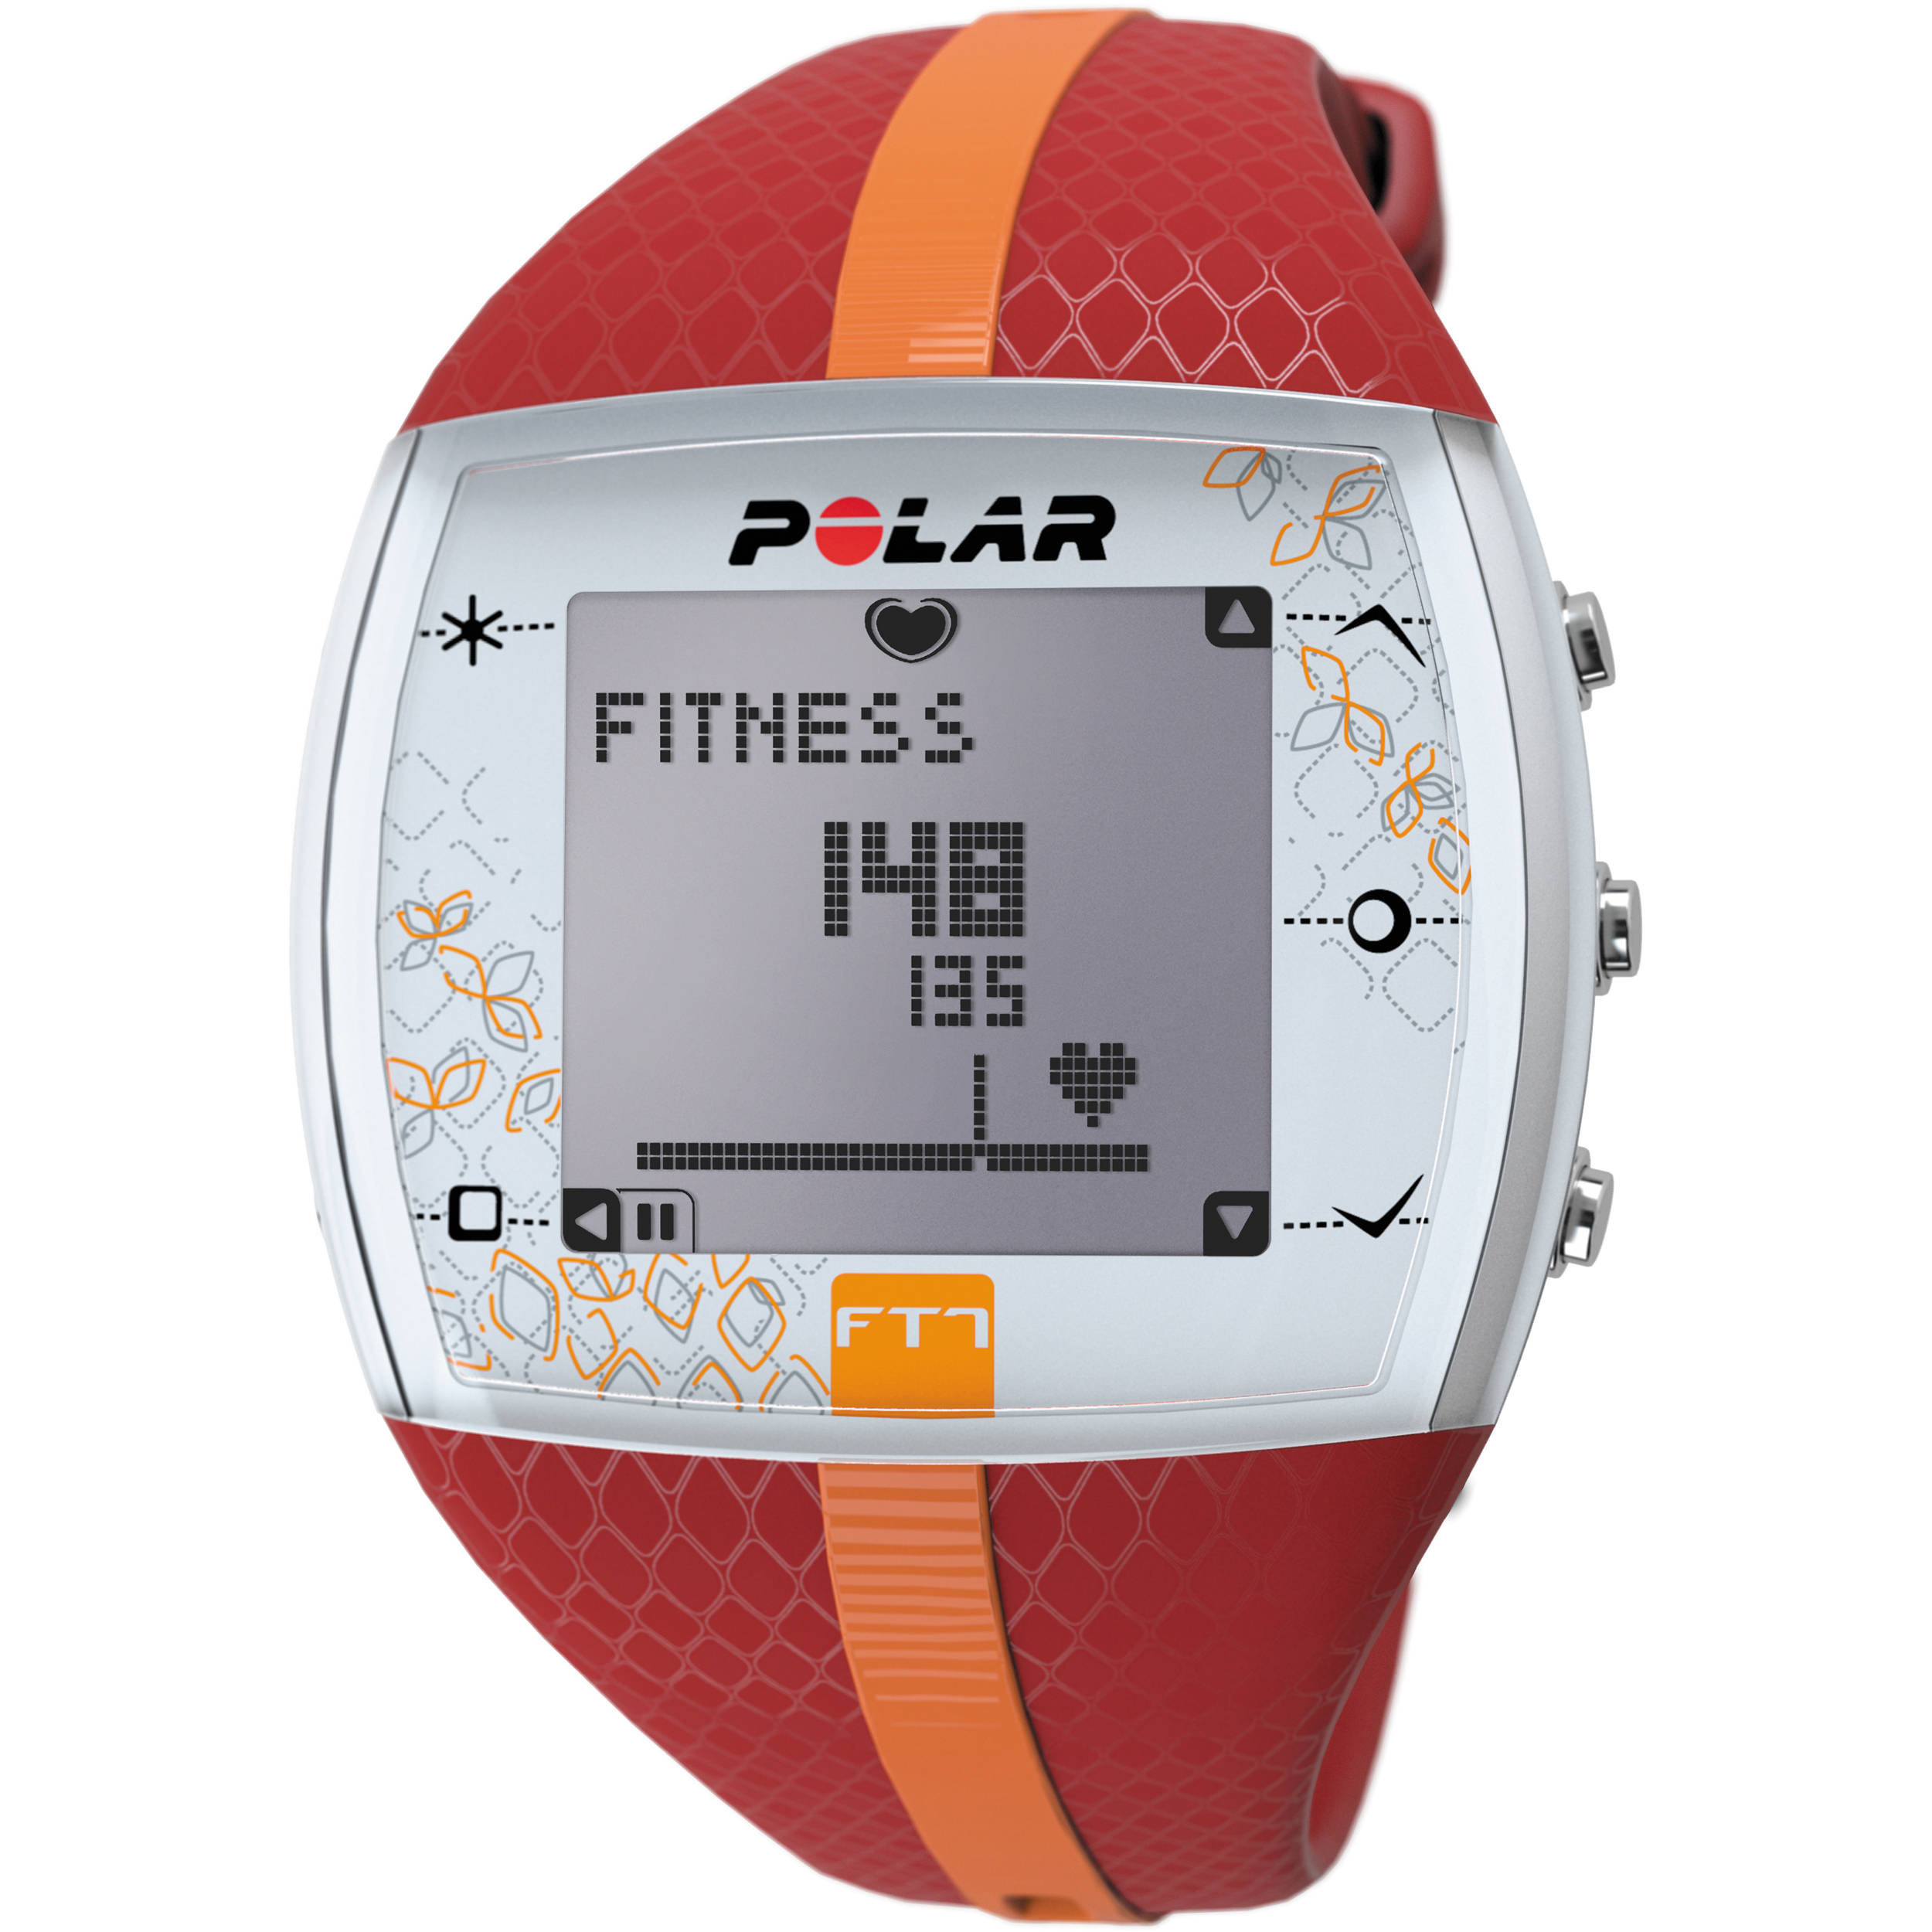 Polar FT7 Training Computer Watch (Red/Orange)